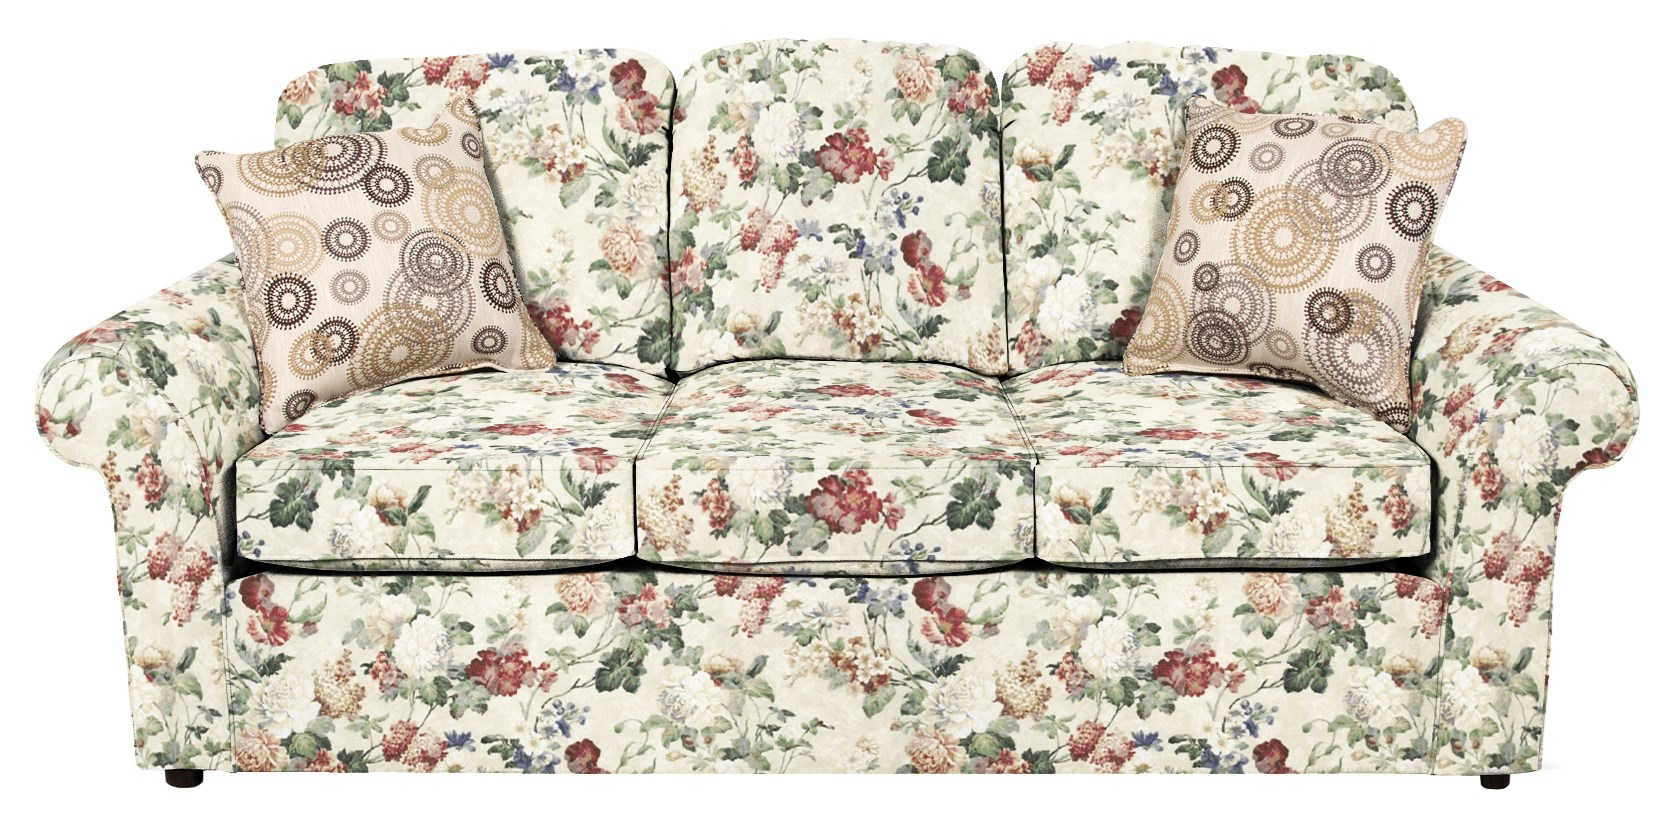 Malibu Sleeper Sofa by England at Lapeer Furniture & Mattress Center